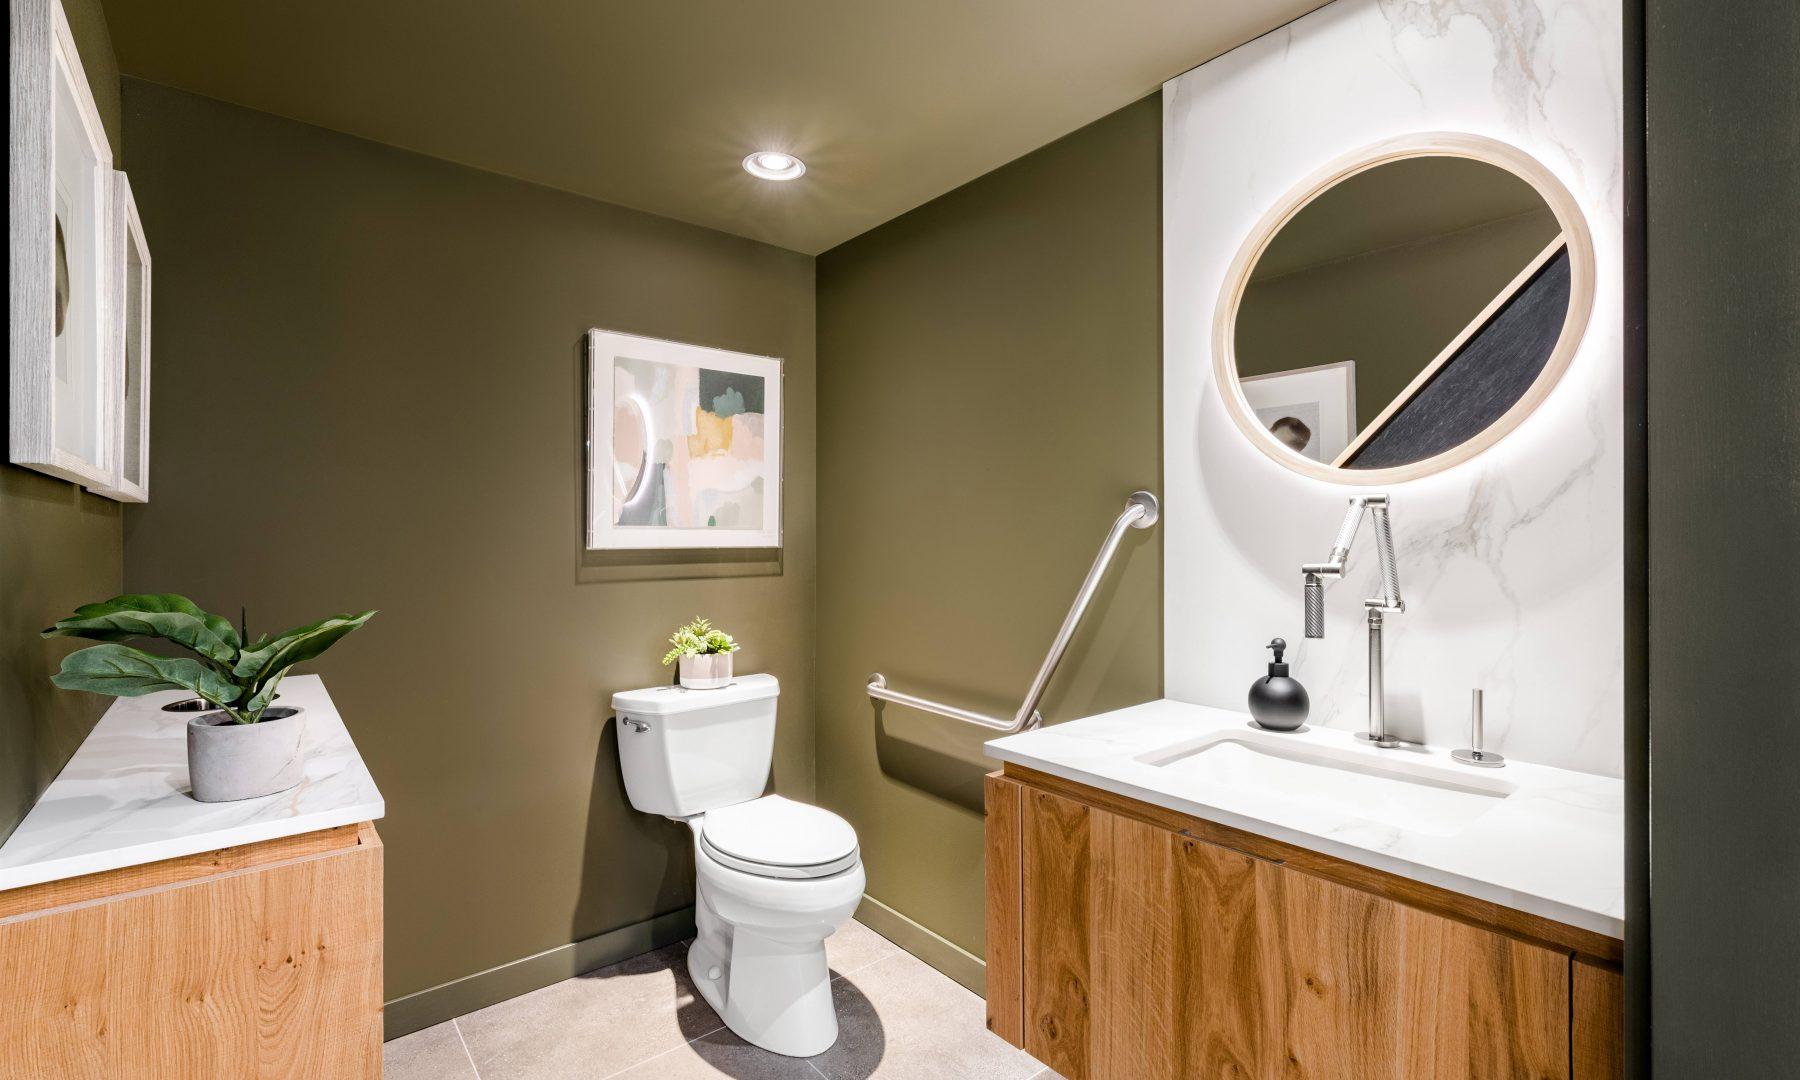 Elmwood Wood Cabinets Kitchen - Blanshard bathroom project - overview